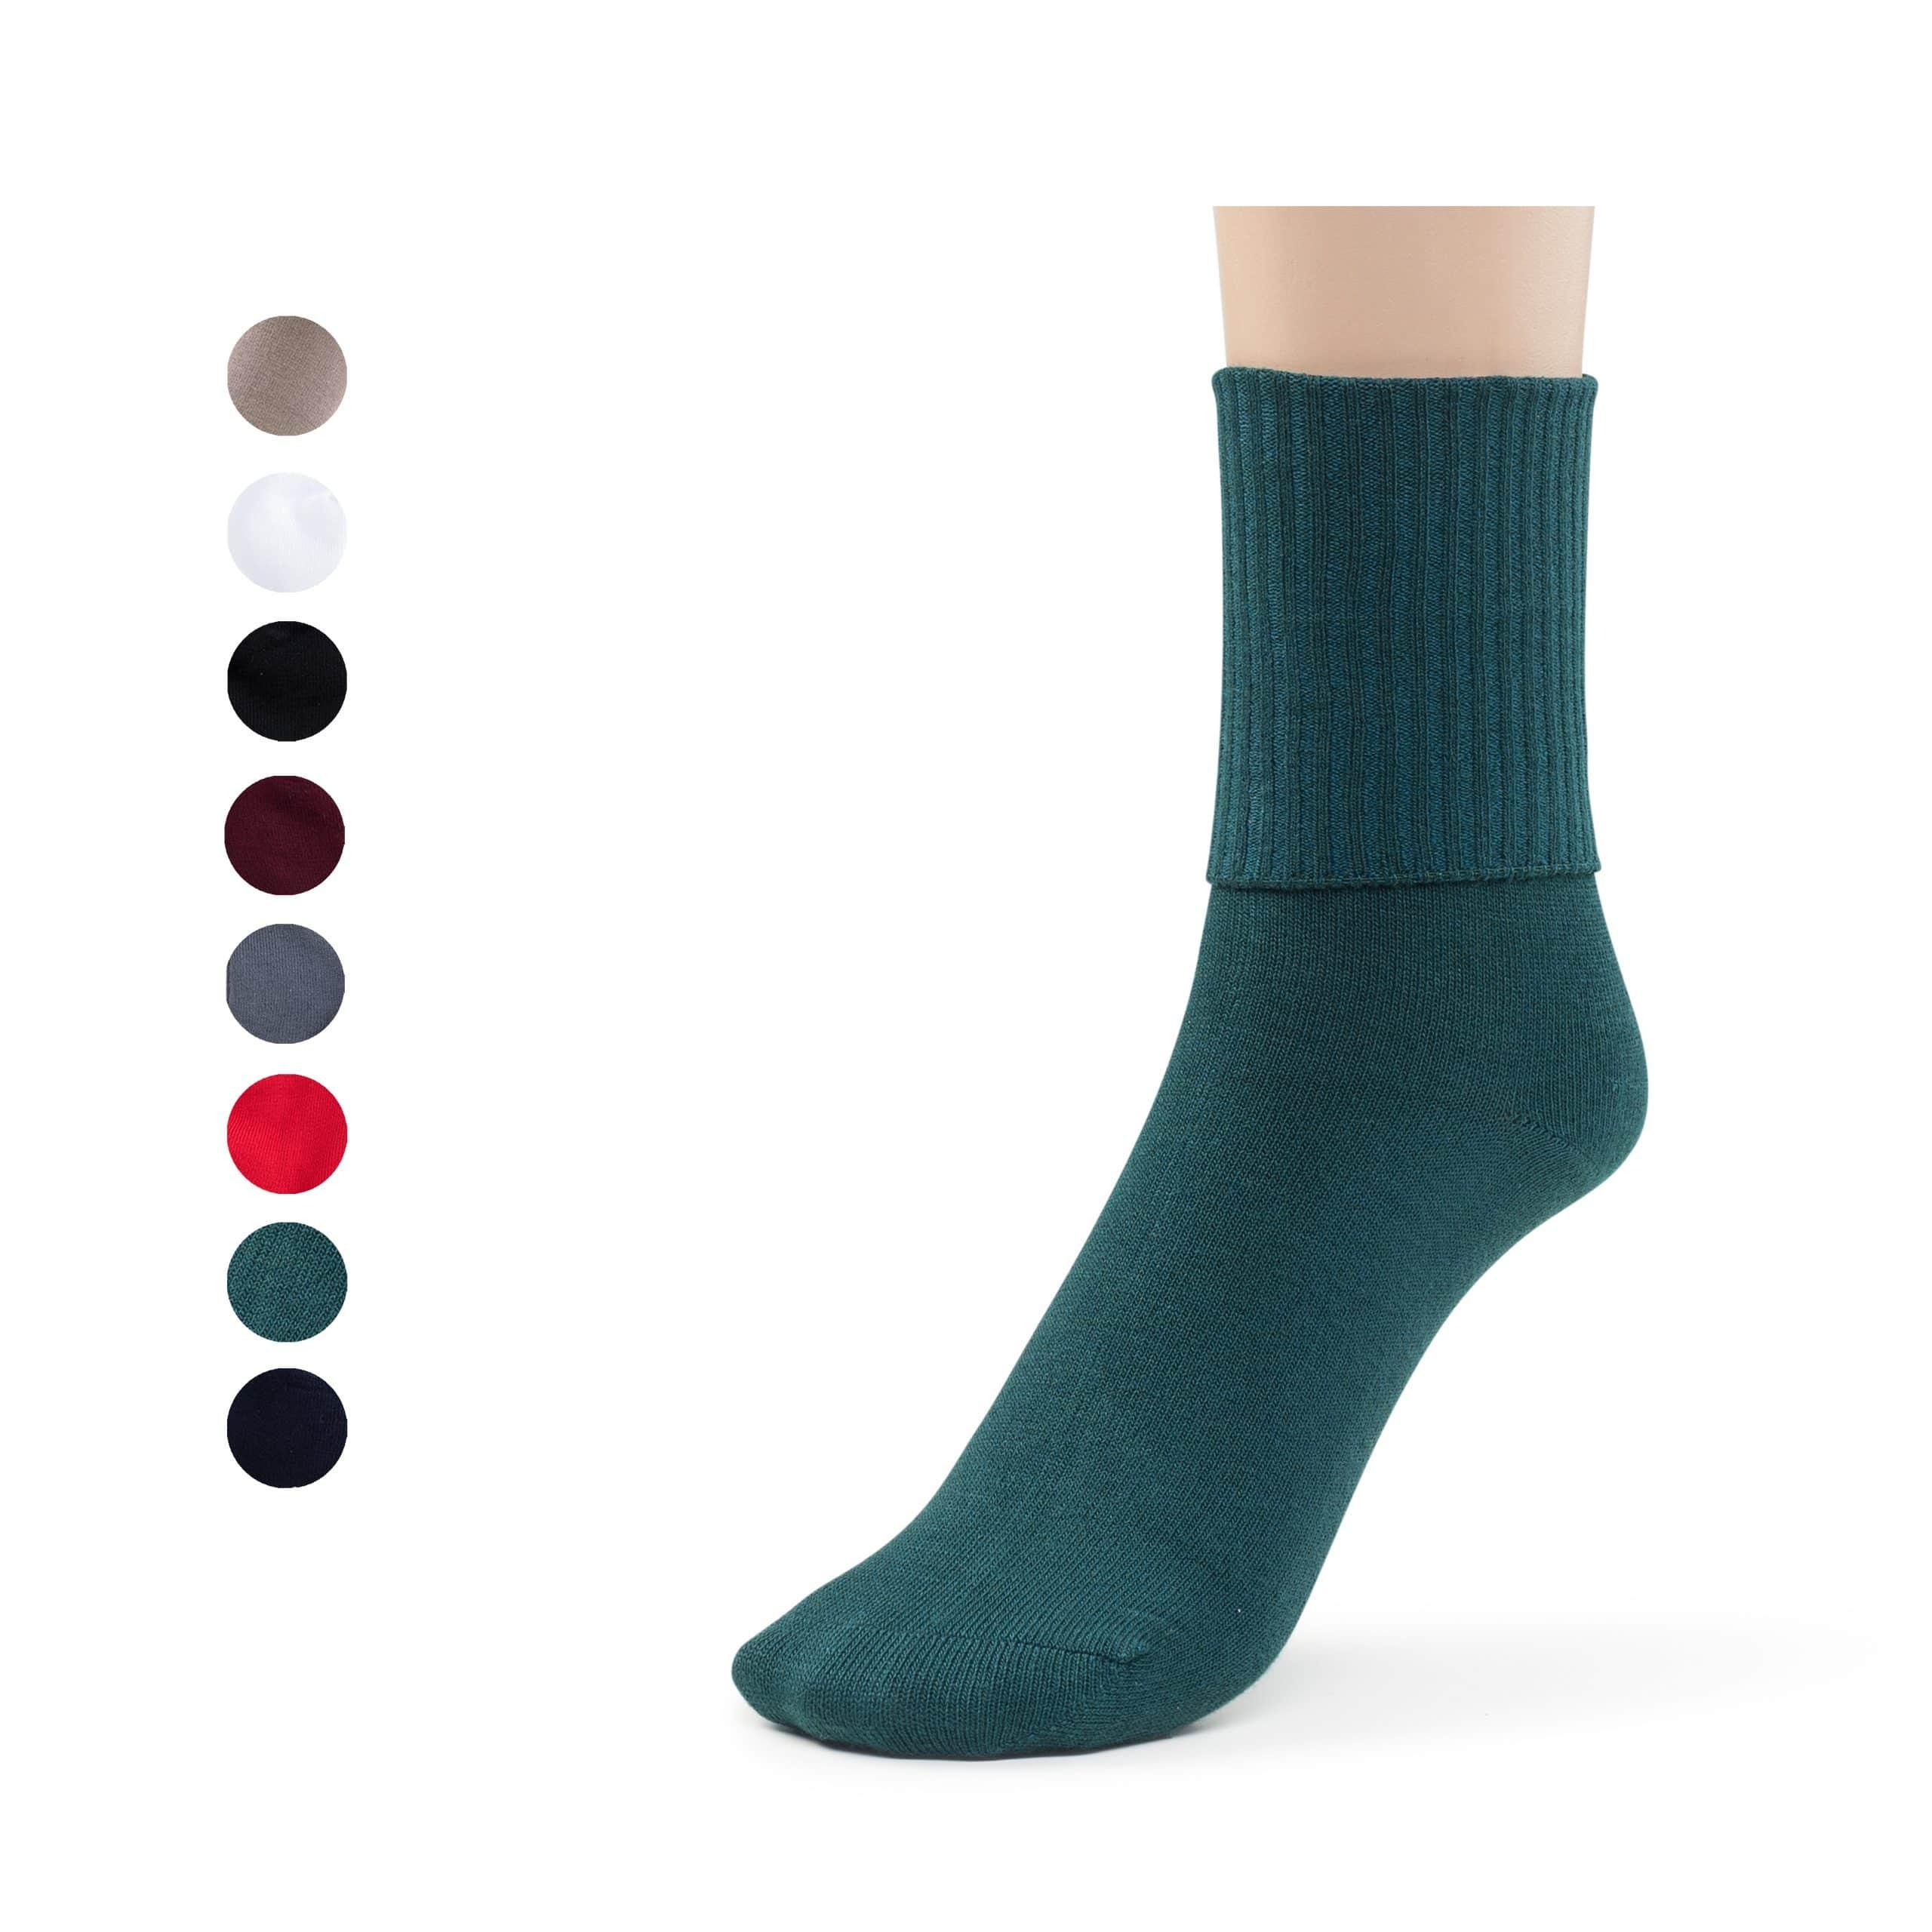 Girls Boys Turn Cuff Bamboo Casual Socks, Triple Roll Dress Crew Socks